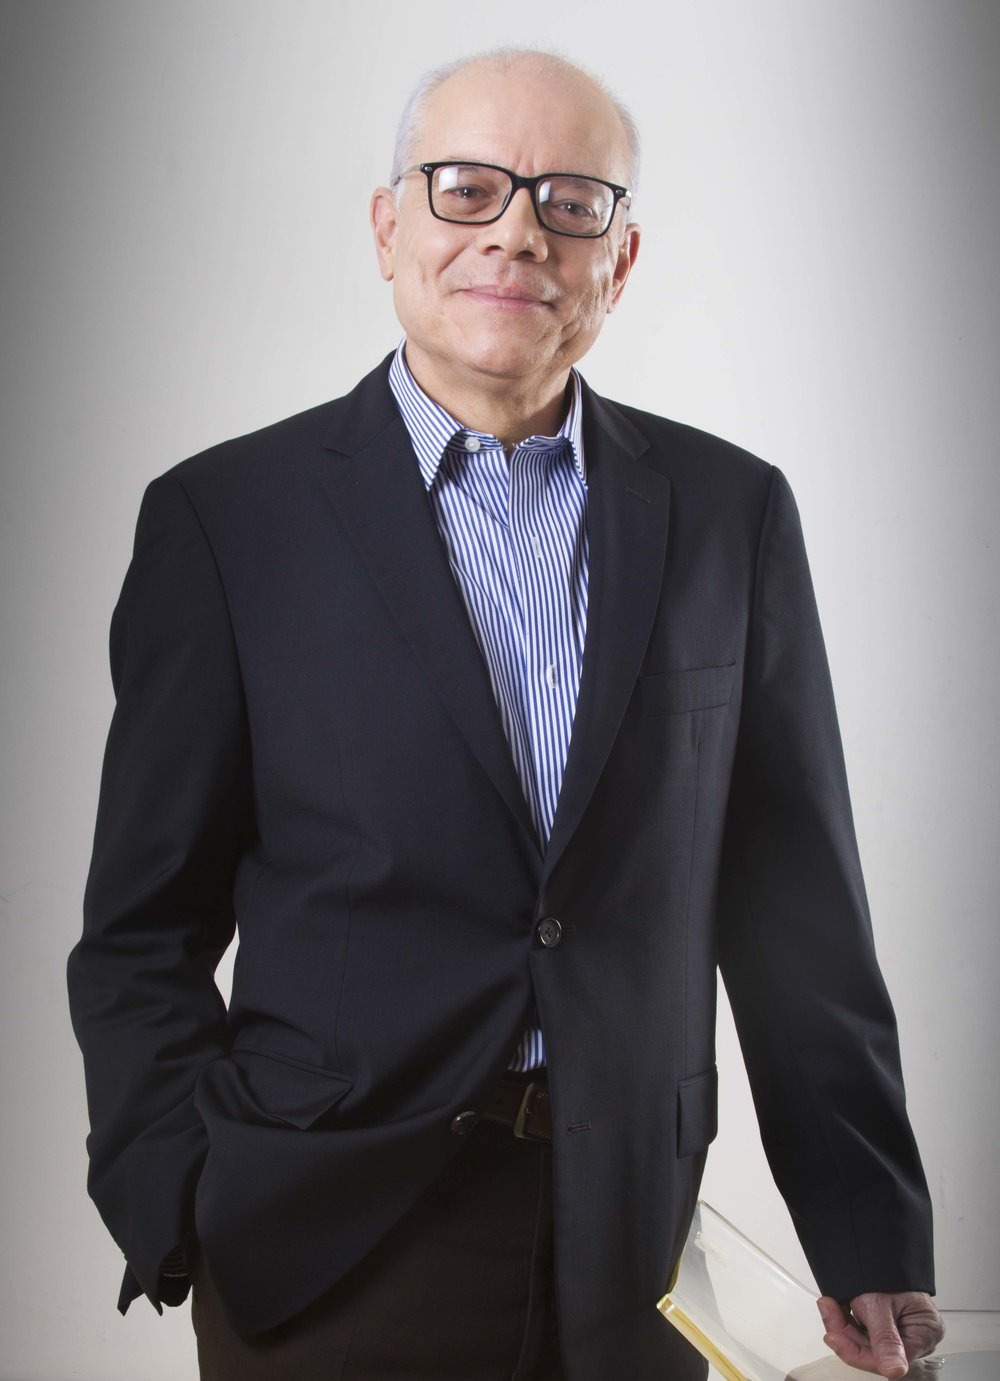 Eduardo Ulibarri Bilbao